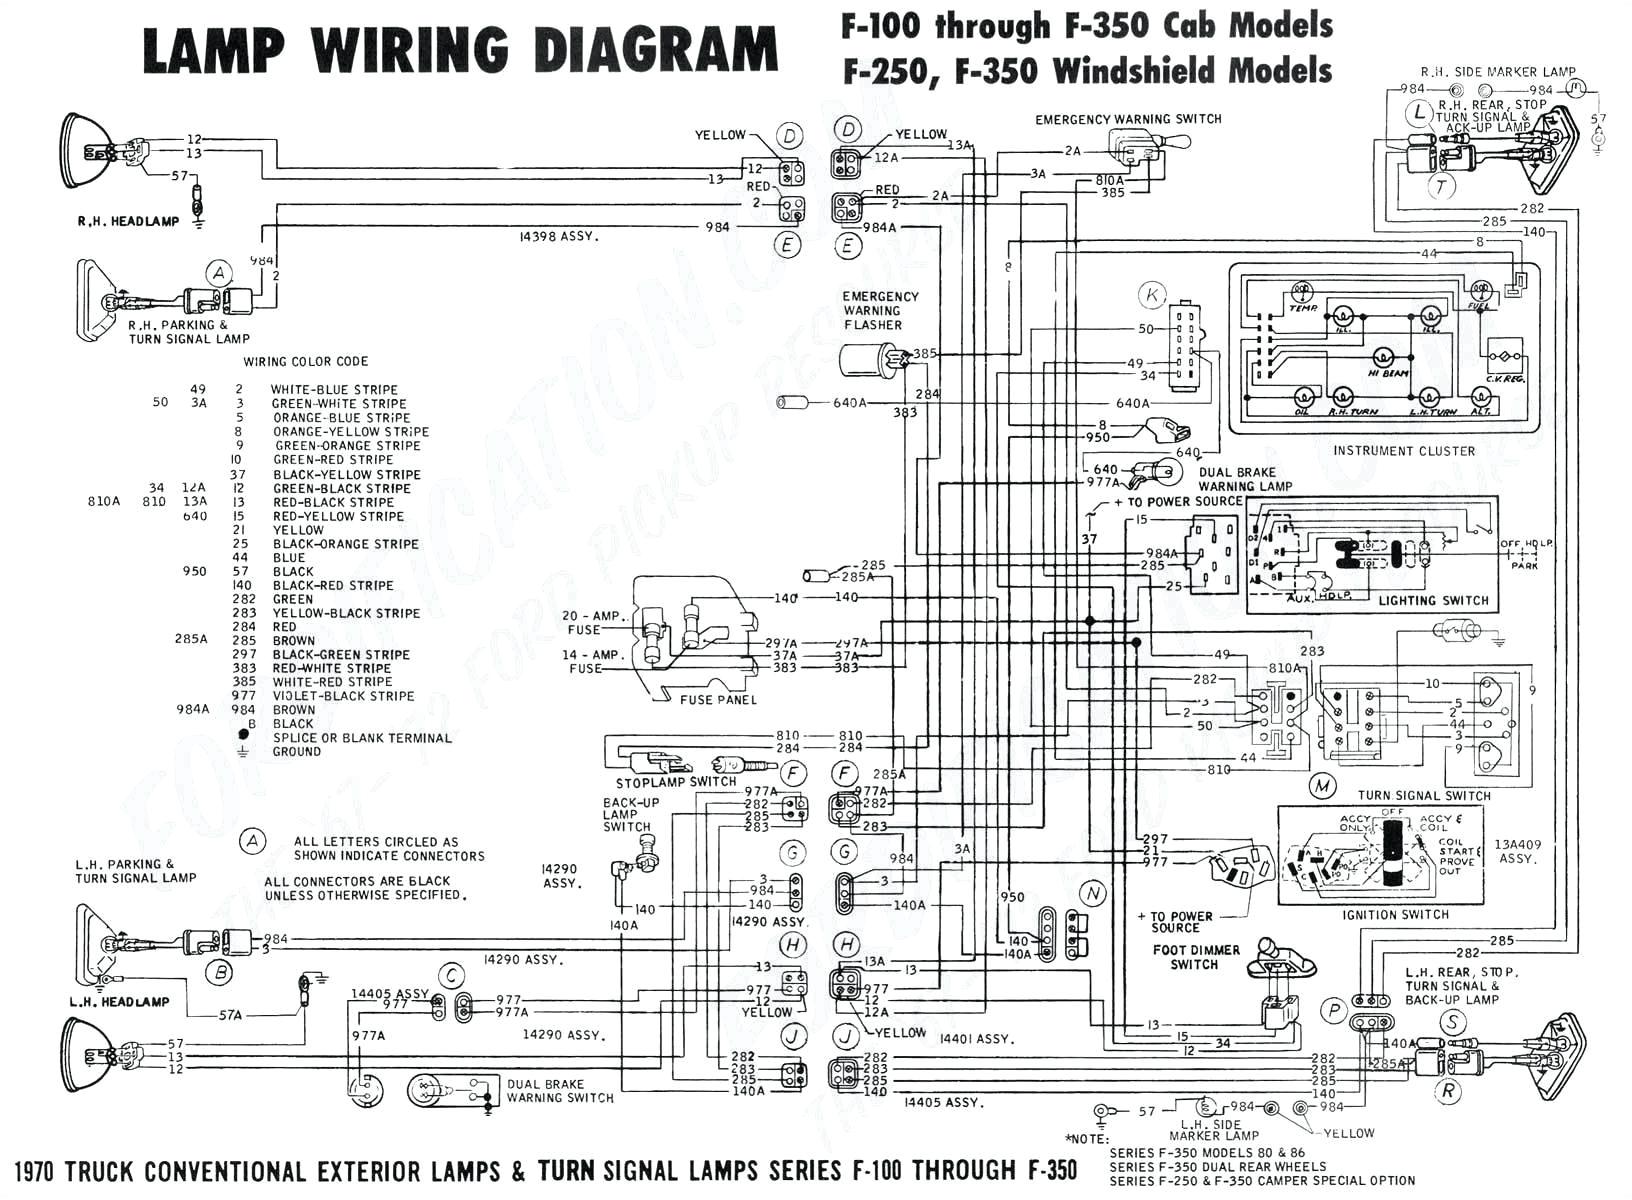 91 honda accord fuse diagram 91 free engine image for user manual 1991 honda accord ecu